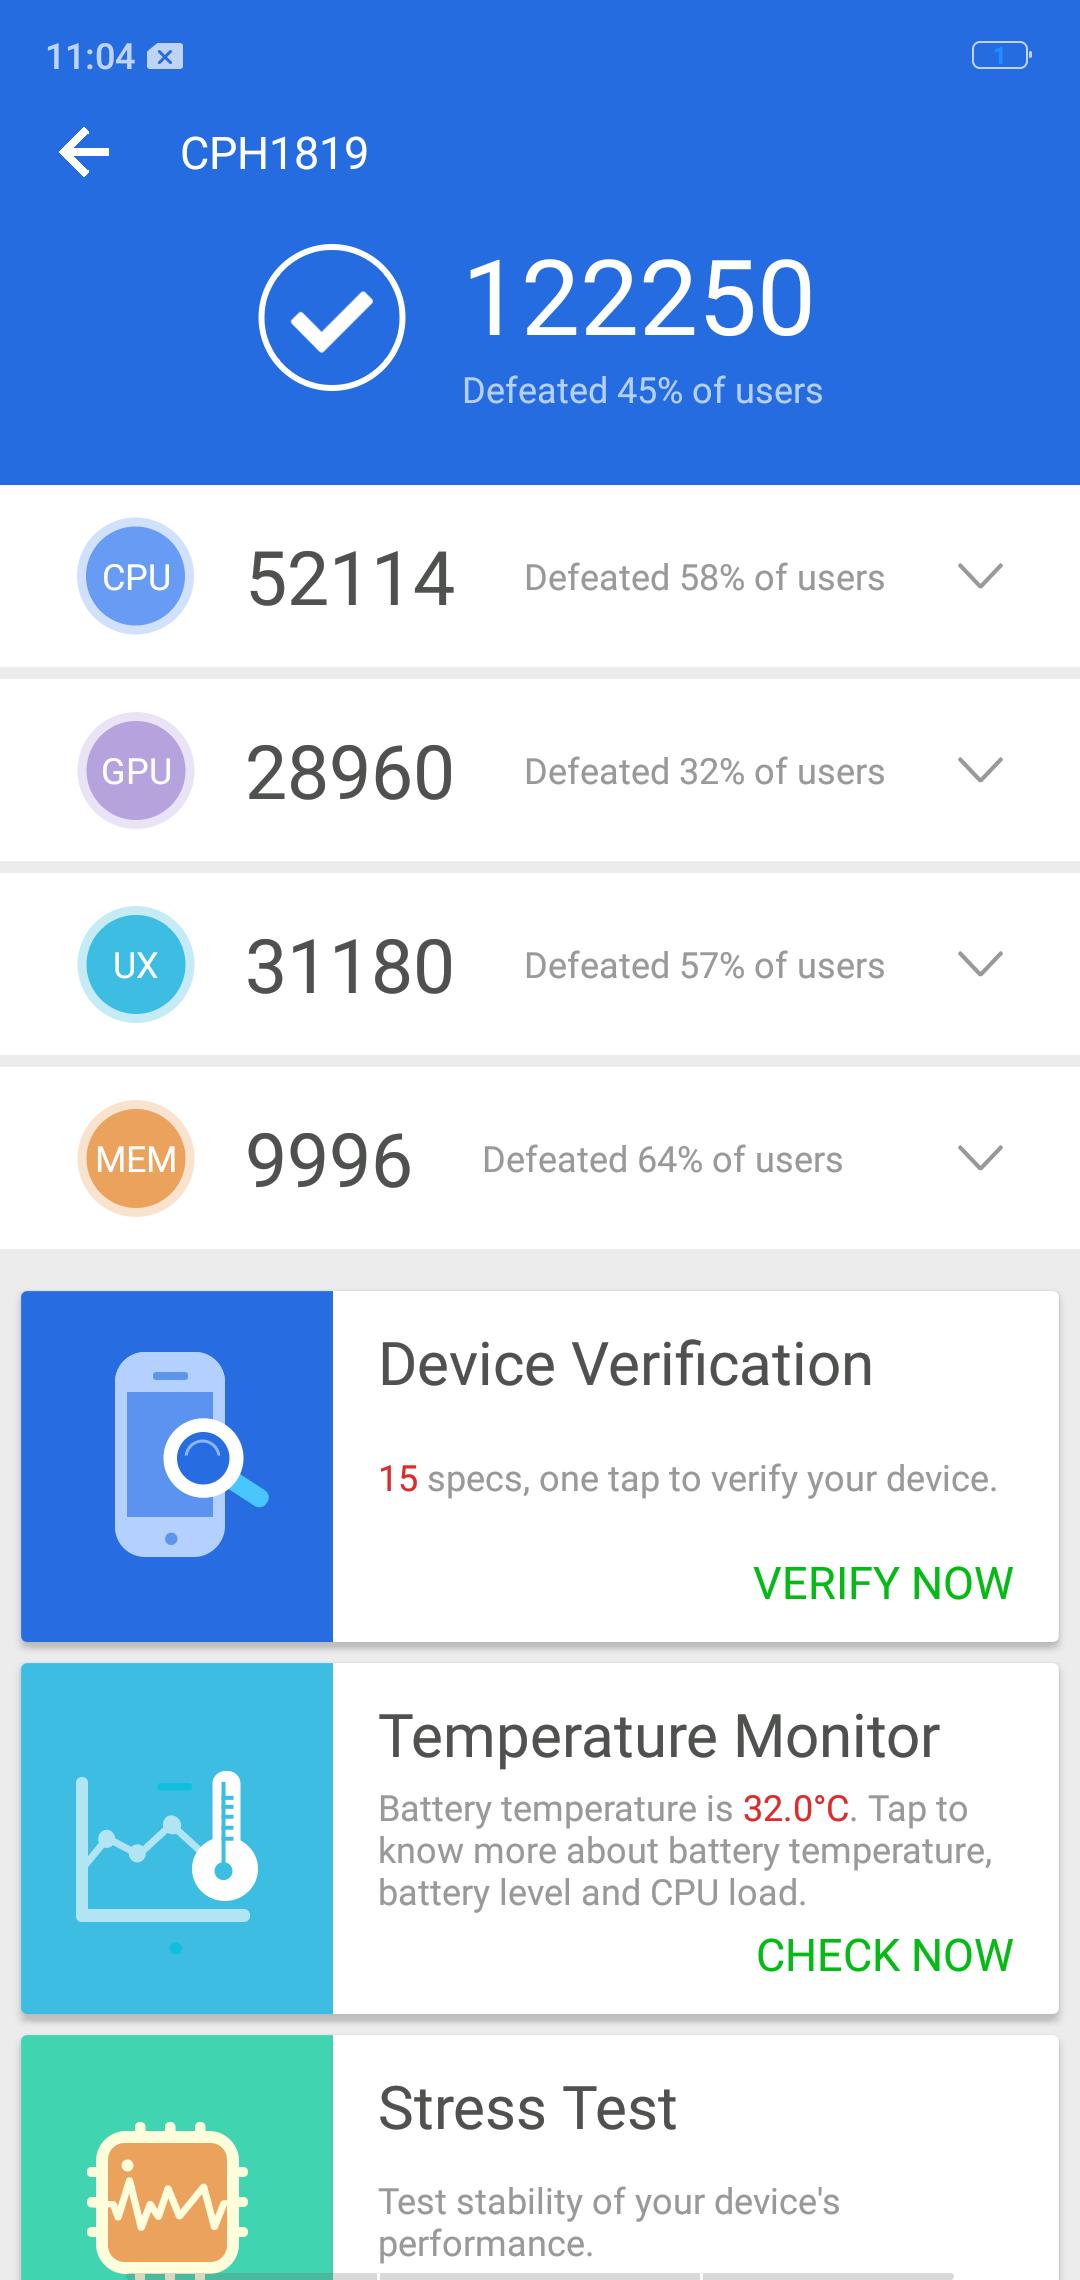 OPPO F7 vs Redmi Note 5 Pro benchmarks 7